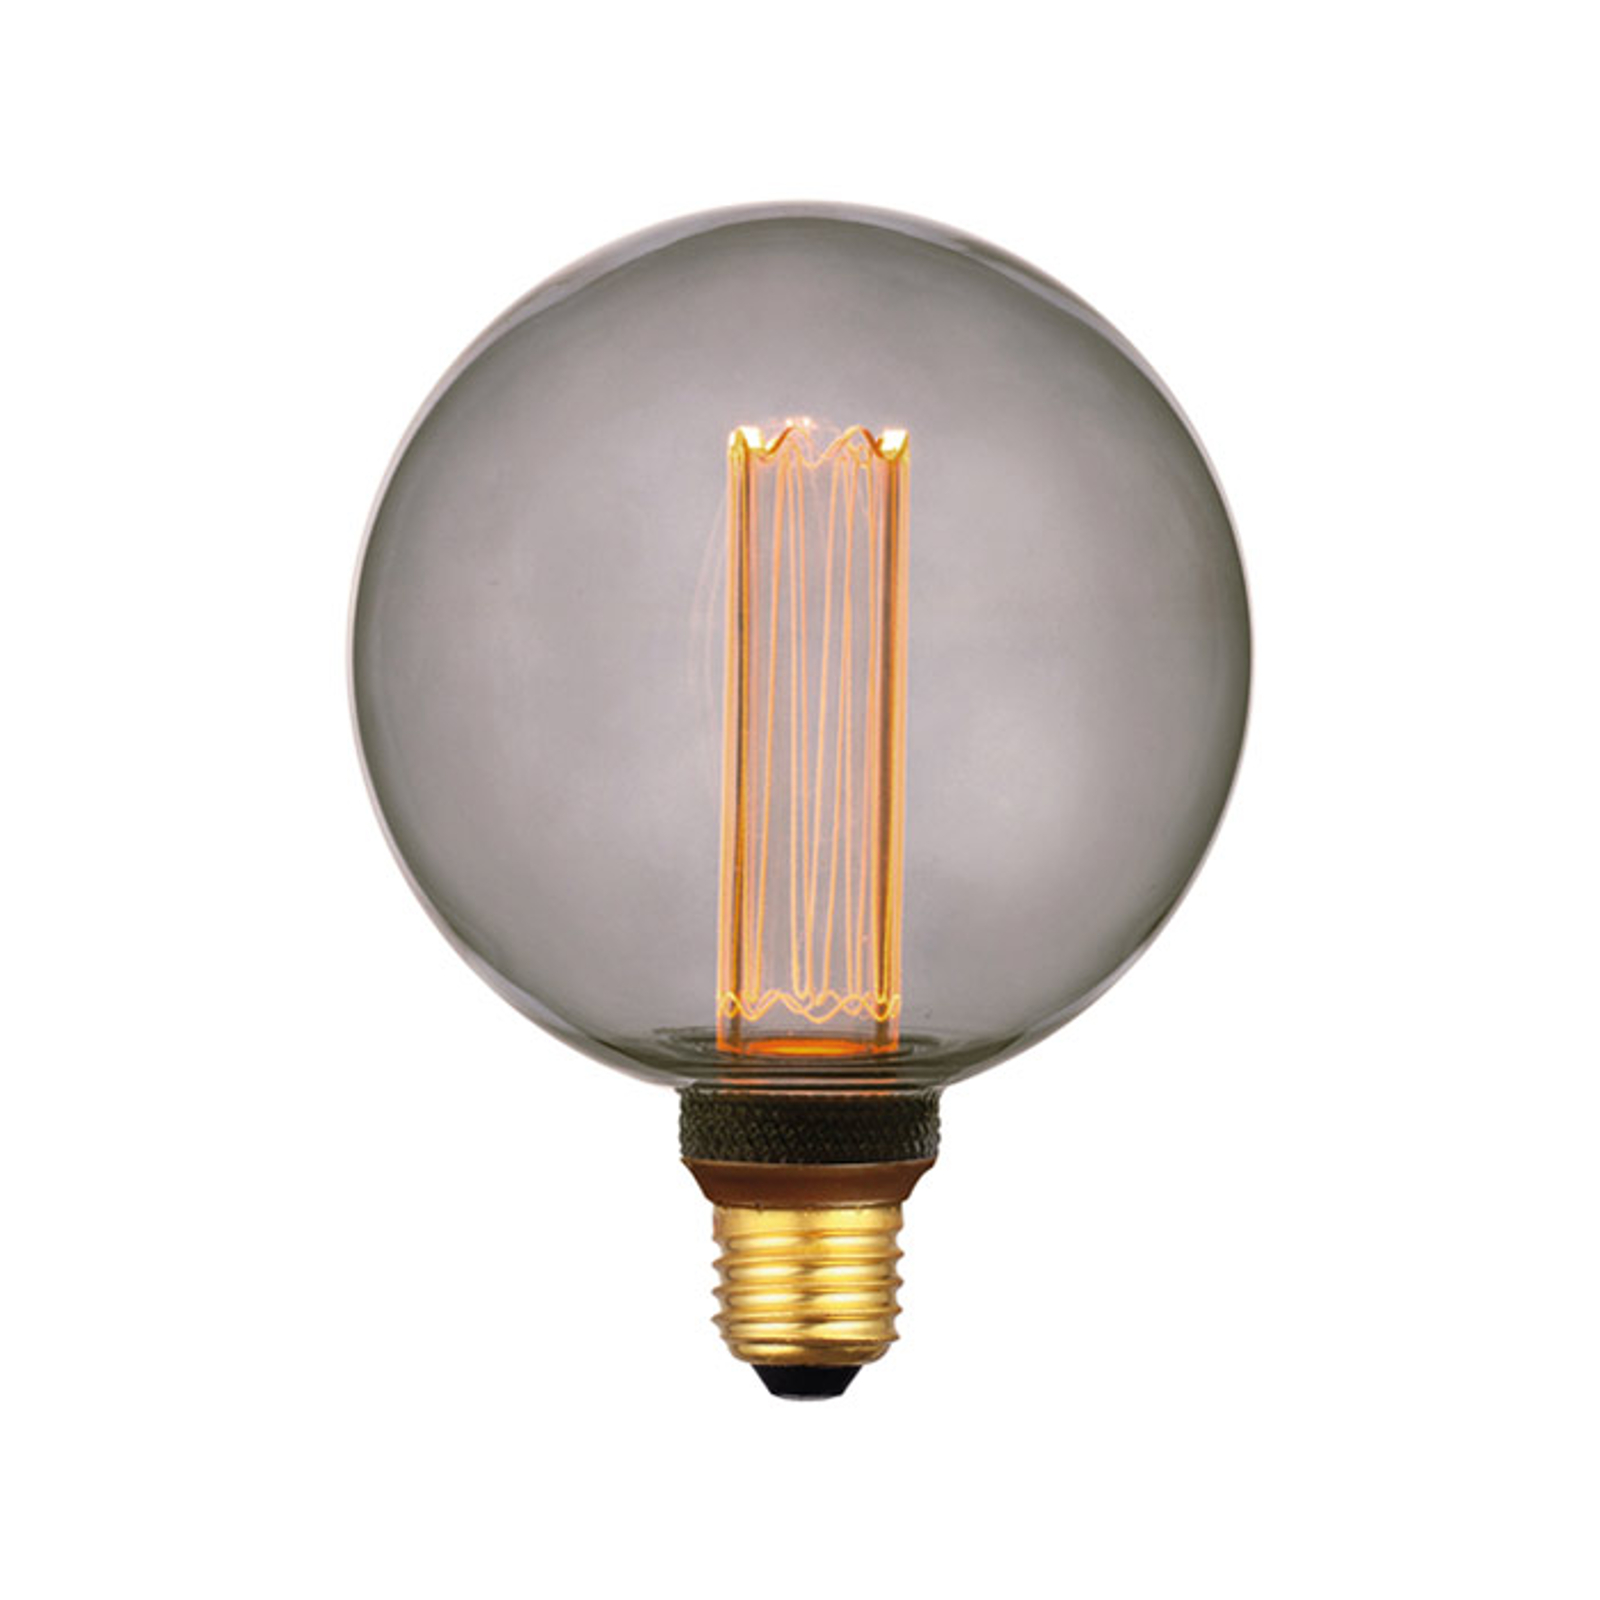 LED-globepære E27 5W, varmhvit, 3-trinns dim, røyk